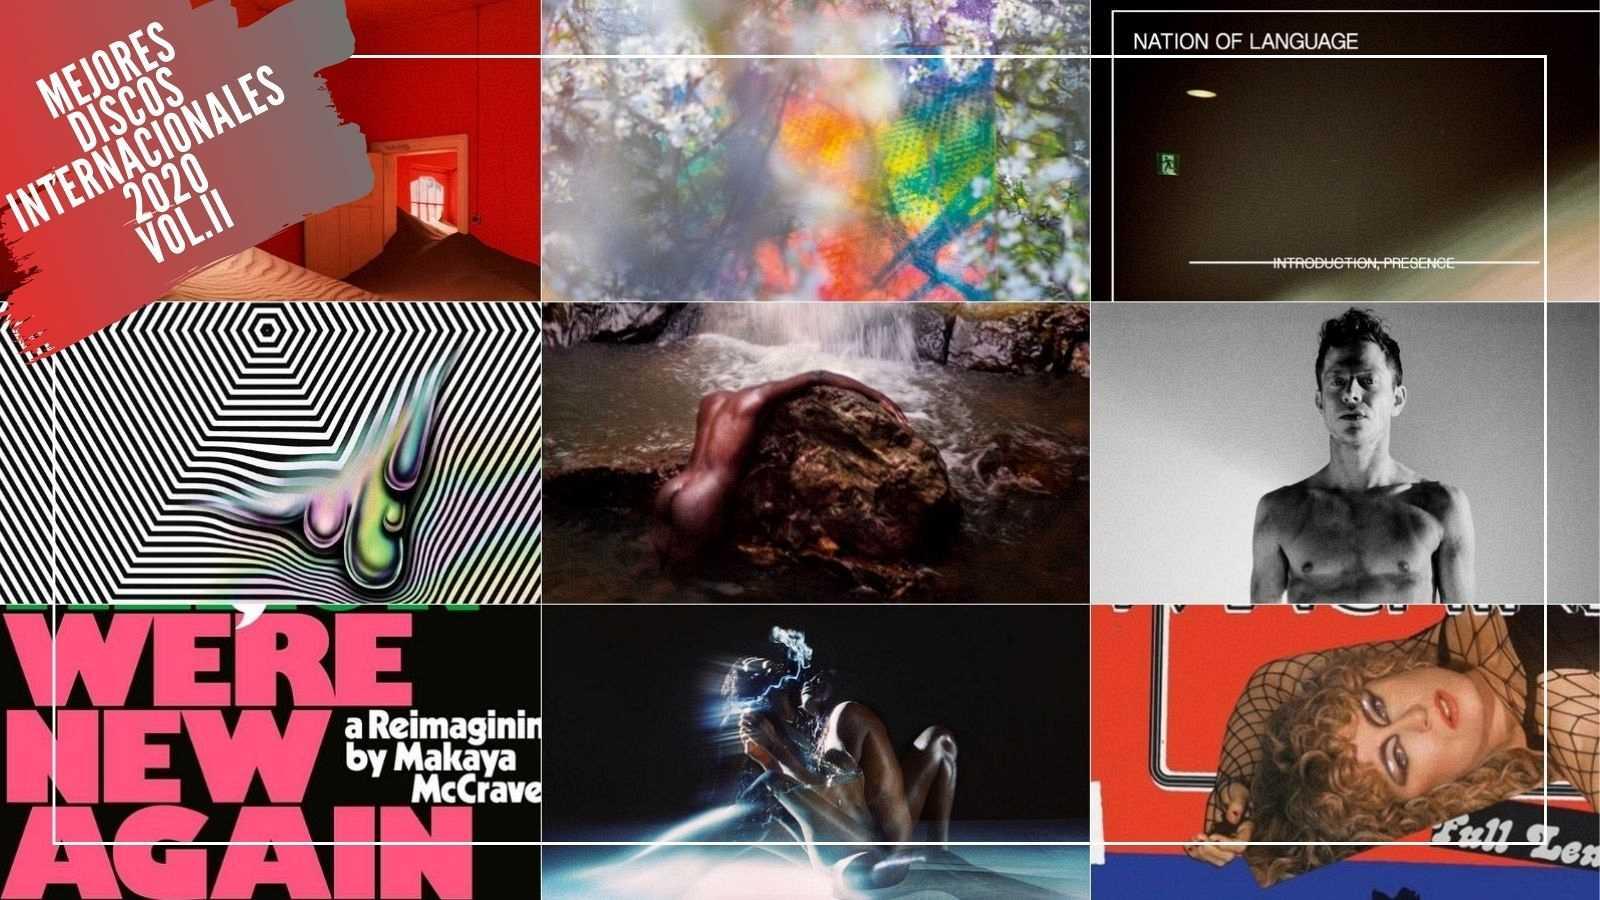 Na Na Na - Los 40 mejores discos internacionales de 2020 (Vol.II) - 28/12/20 - escuchar ahora